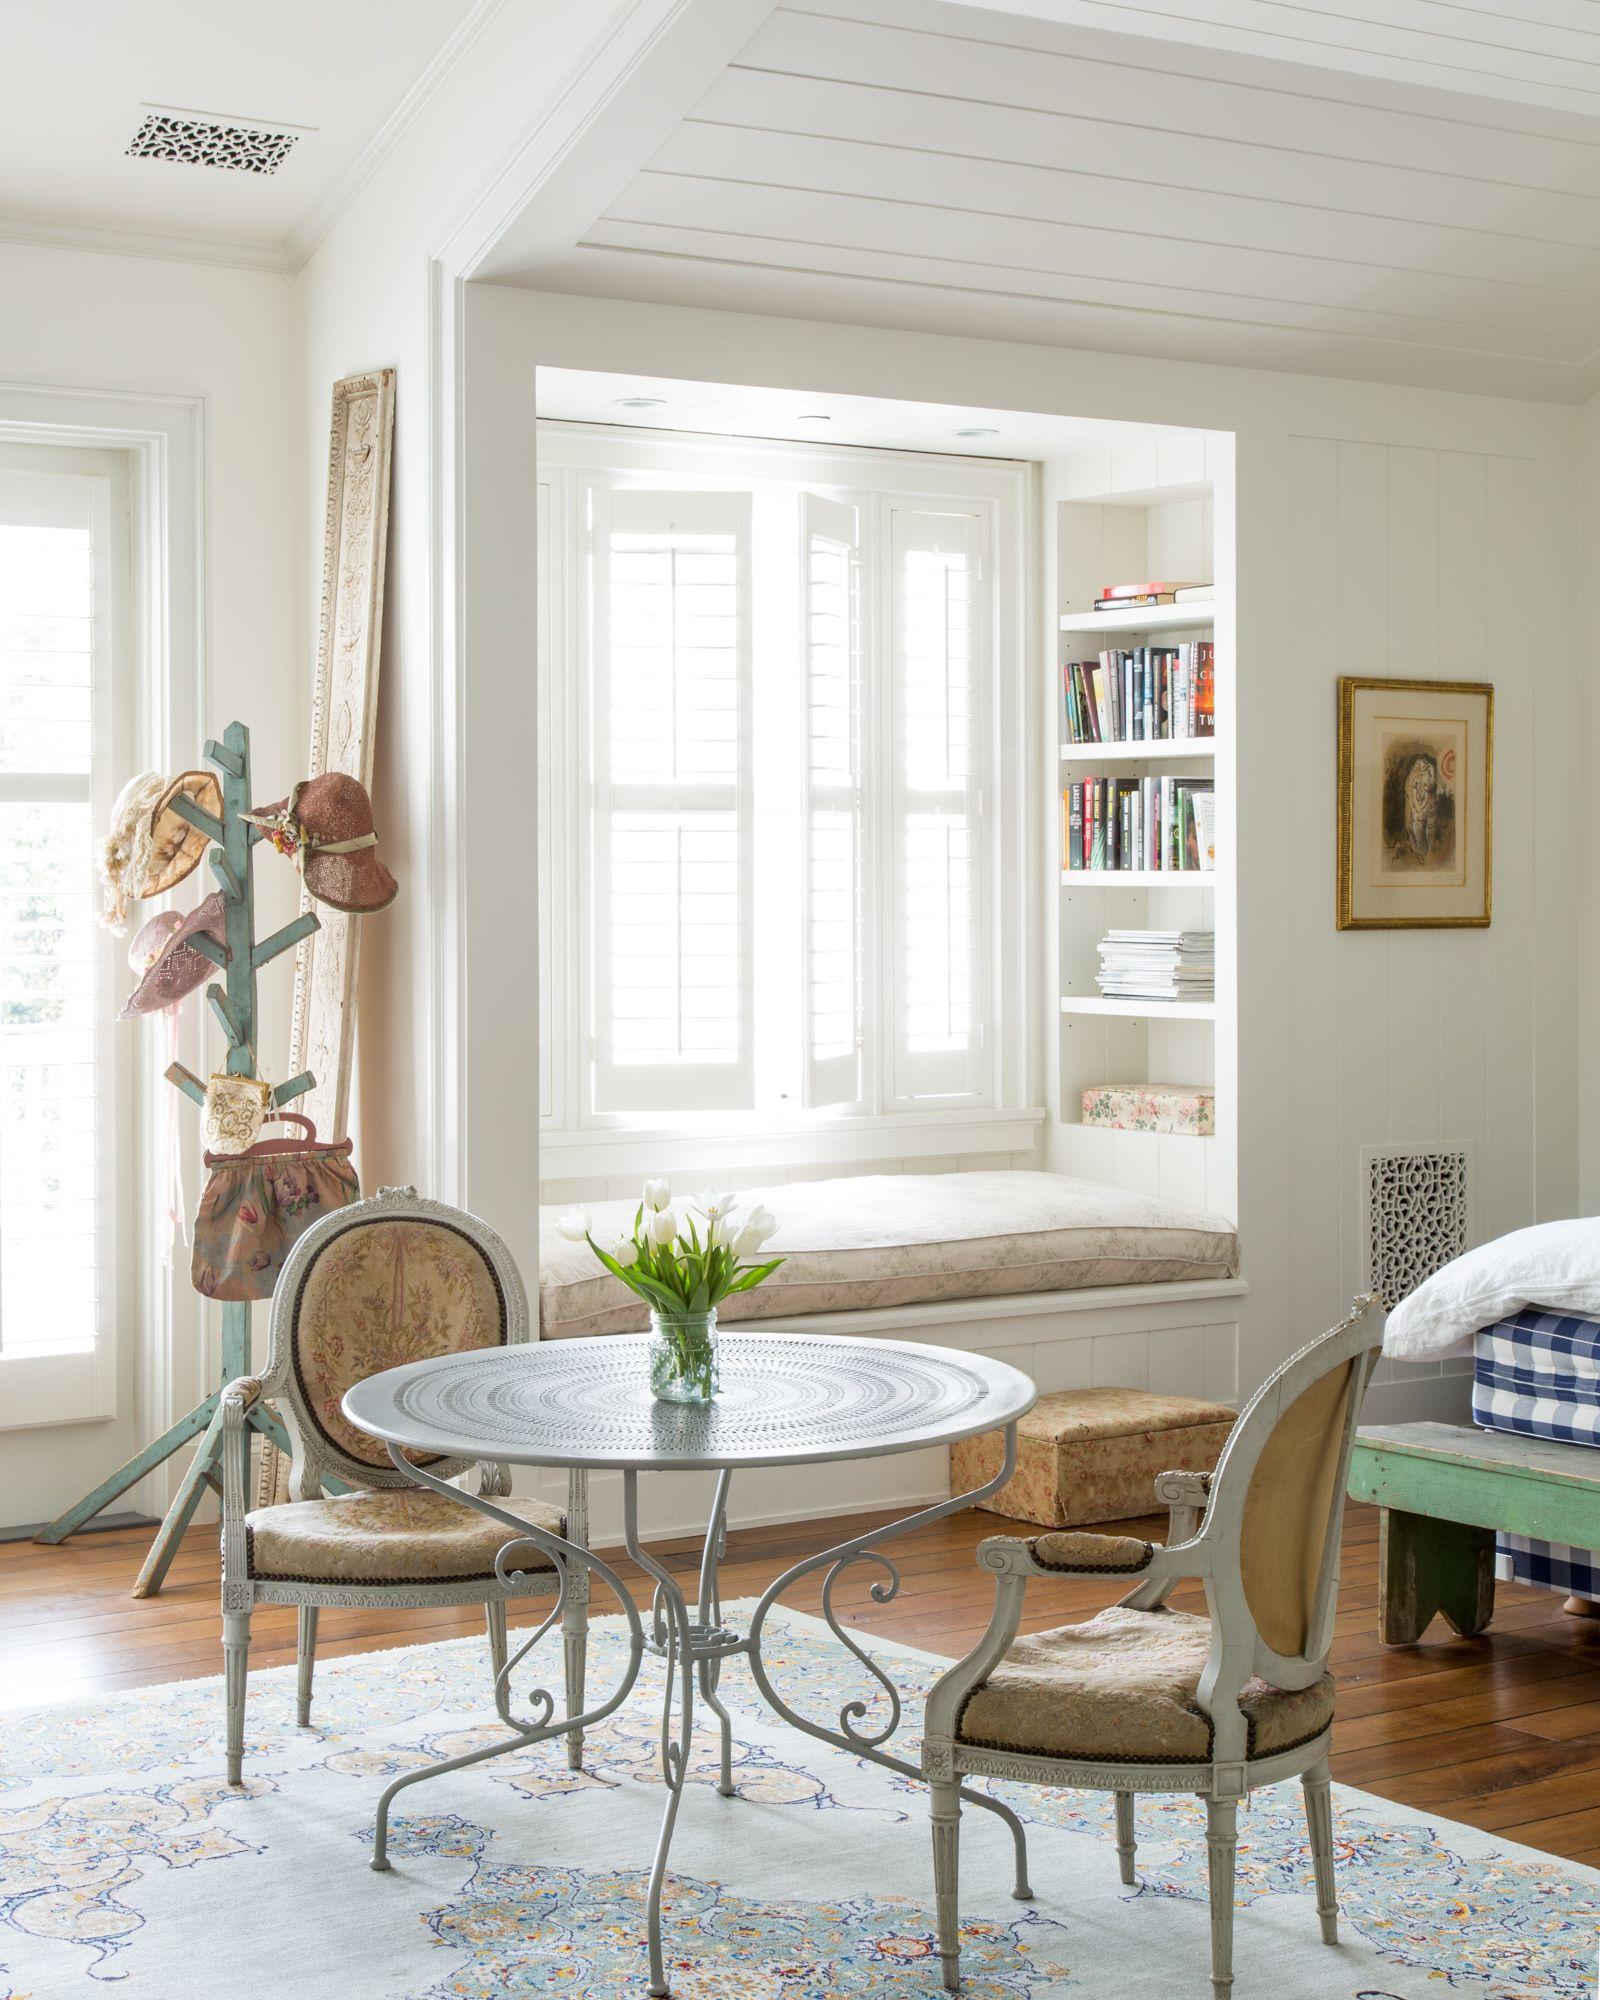 Traditional romantic master bedroom decor  aedbbcffbpi  pixels  English